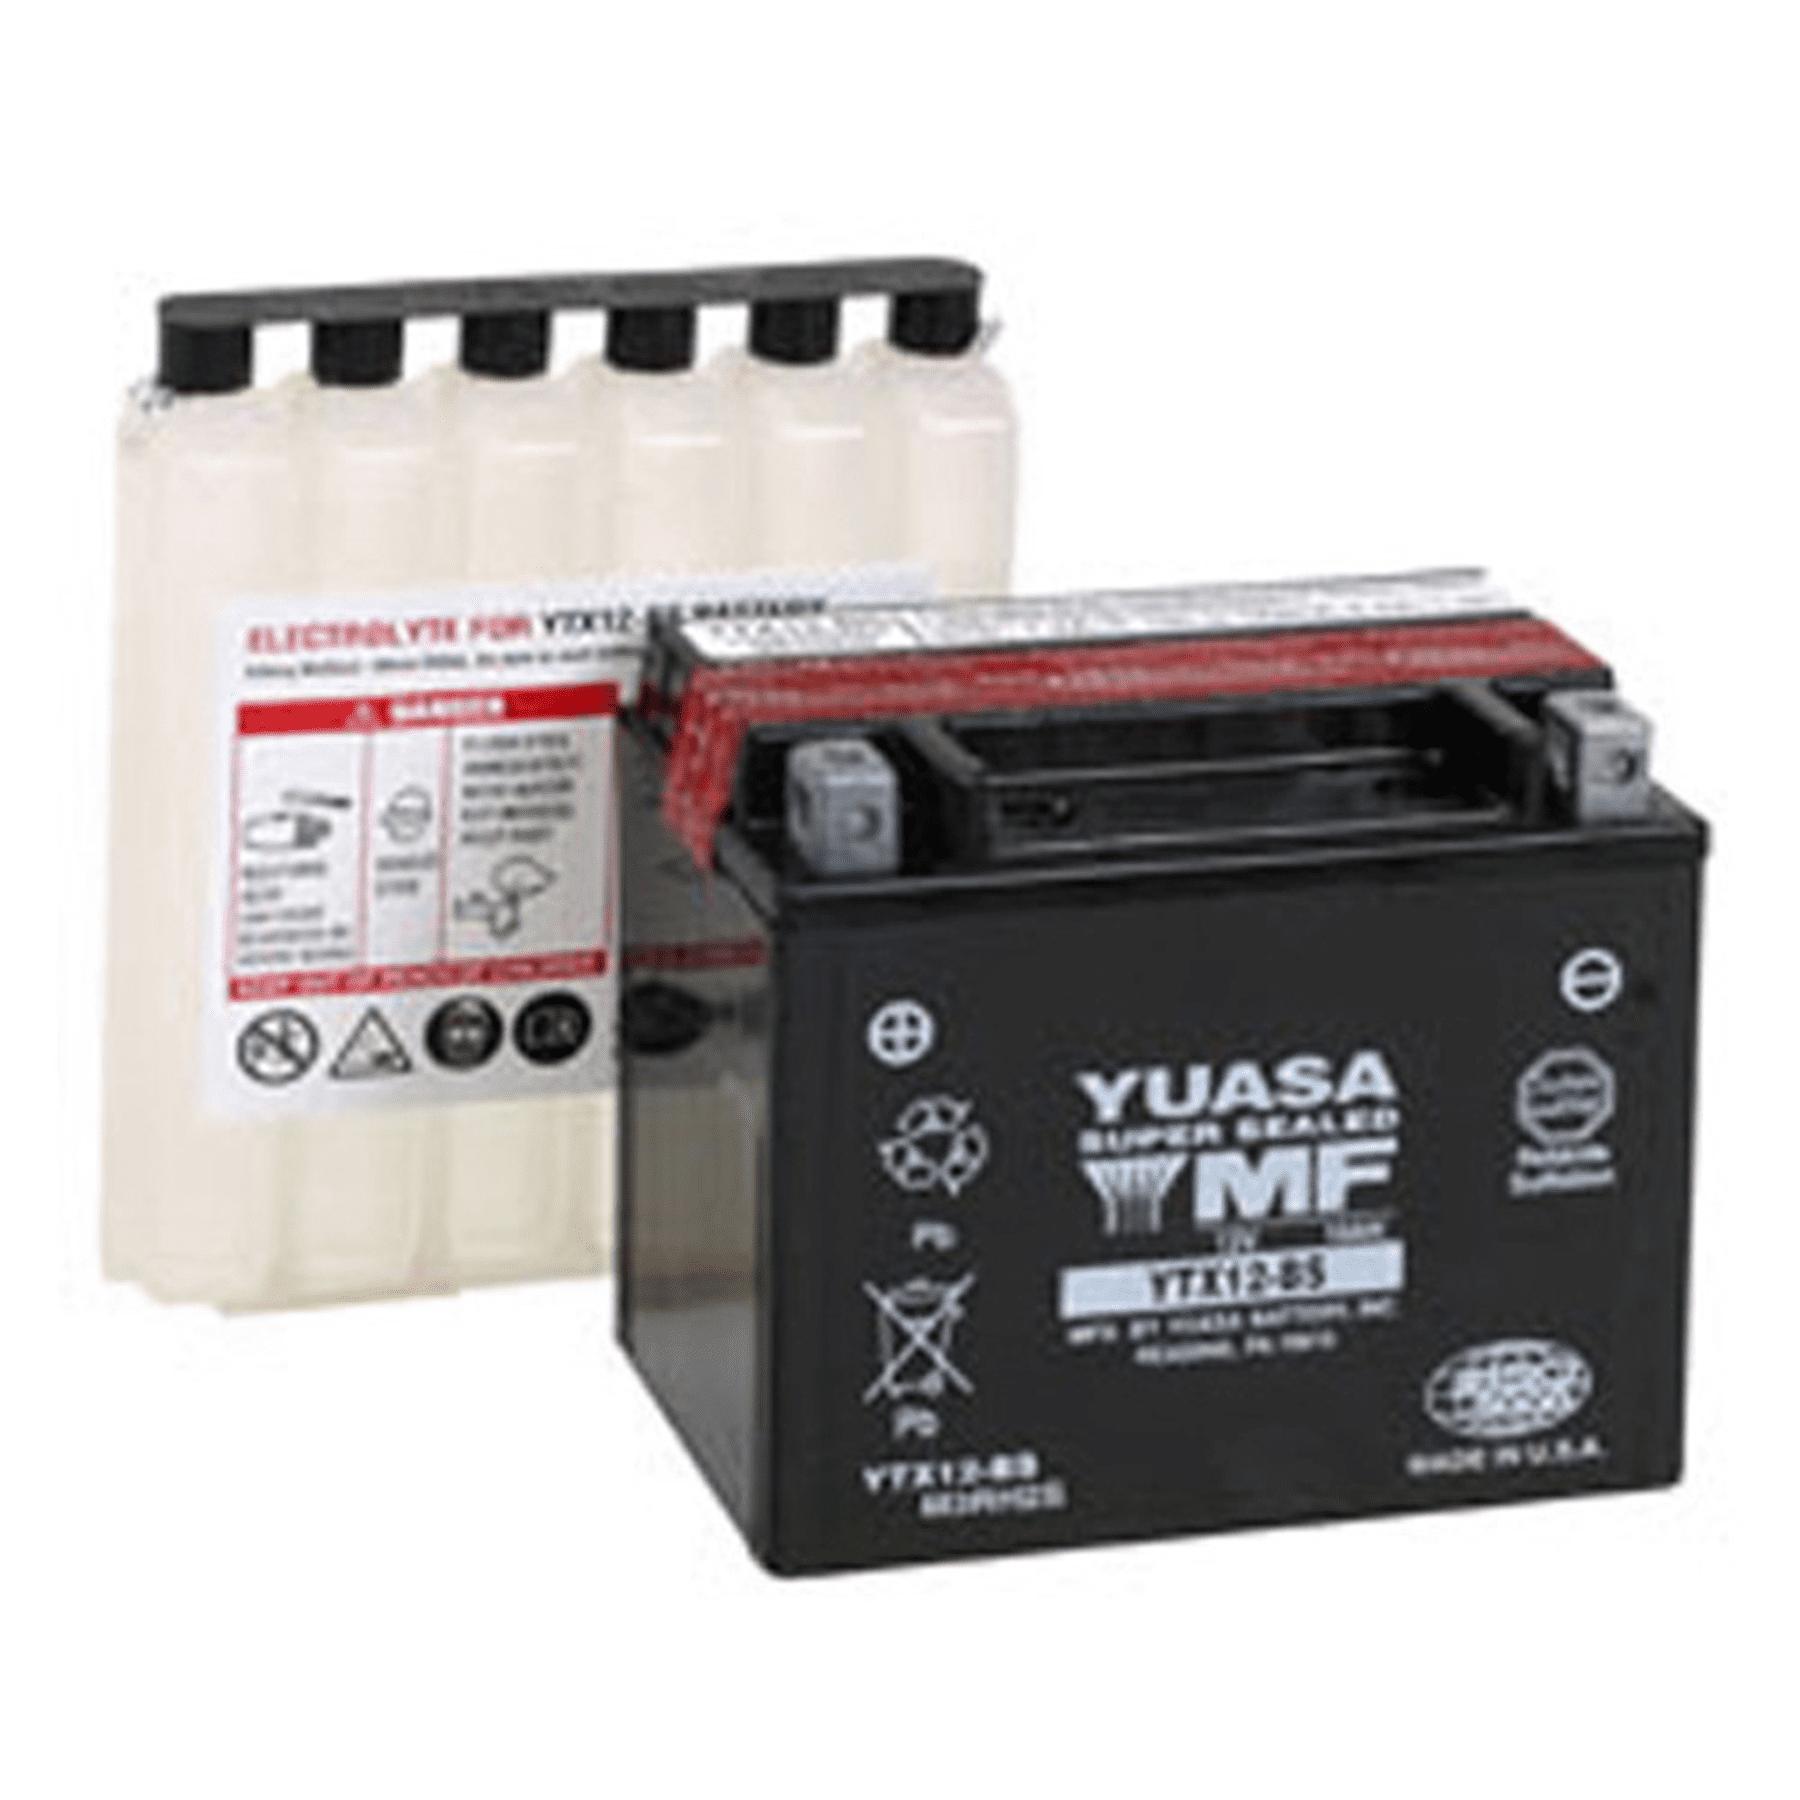 YUASA YTX12-BS MAINTENANCE FREE 12 VOLT BATTERY